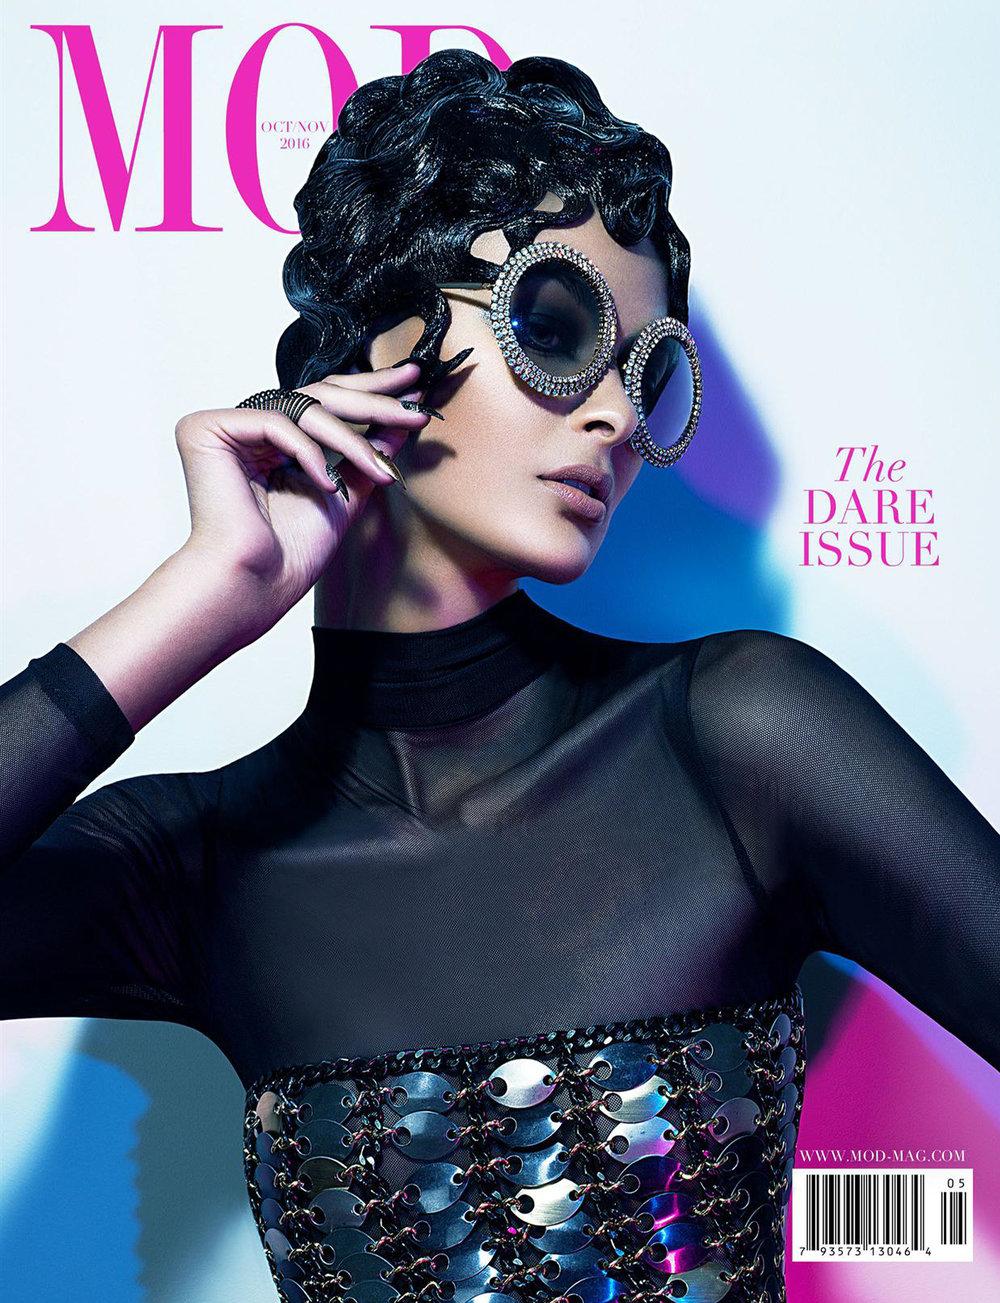 med  res 200 dpi Volume_5_MOD_Magazine_Volume_5_Issue_5_The_Dare_Issue-1.jpg